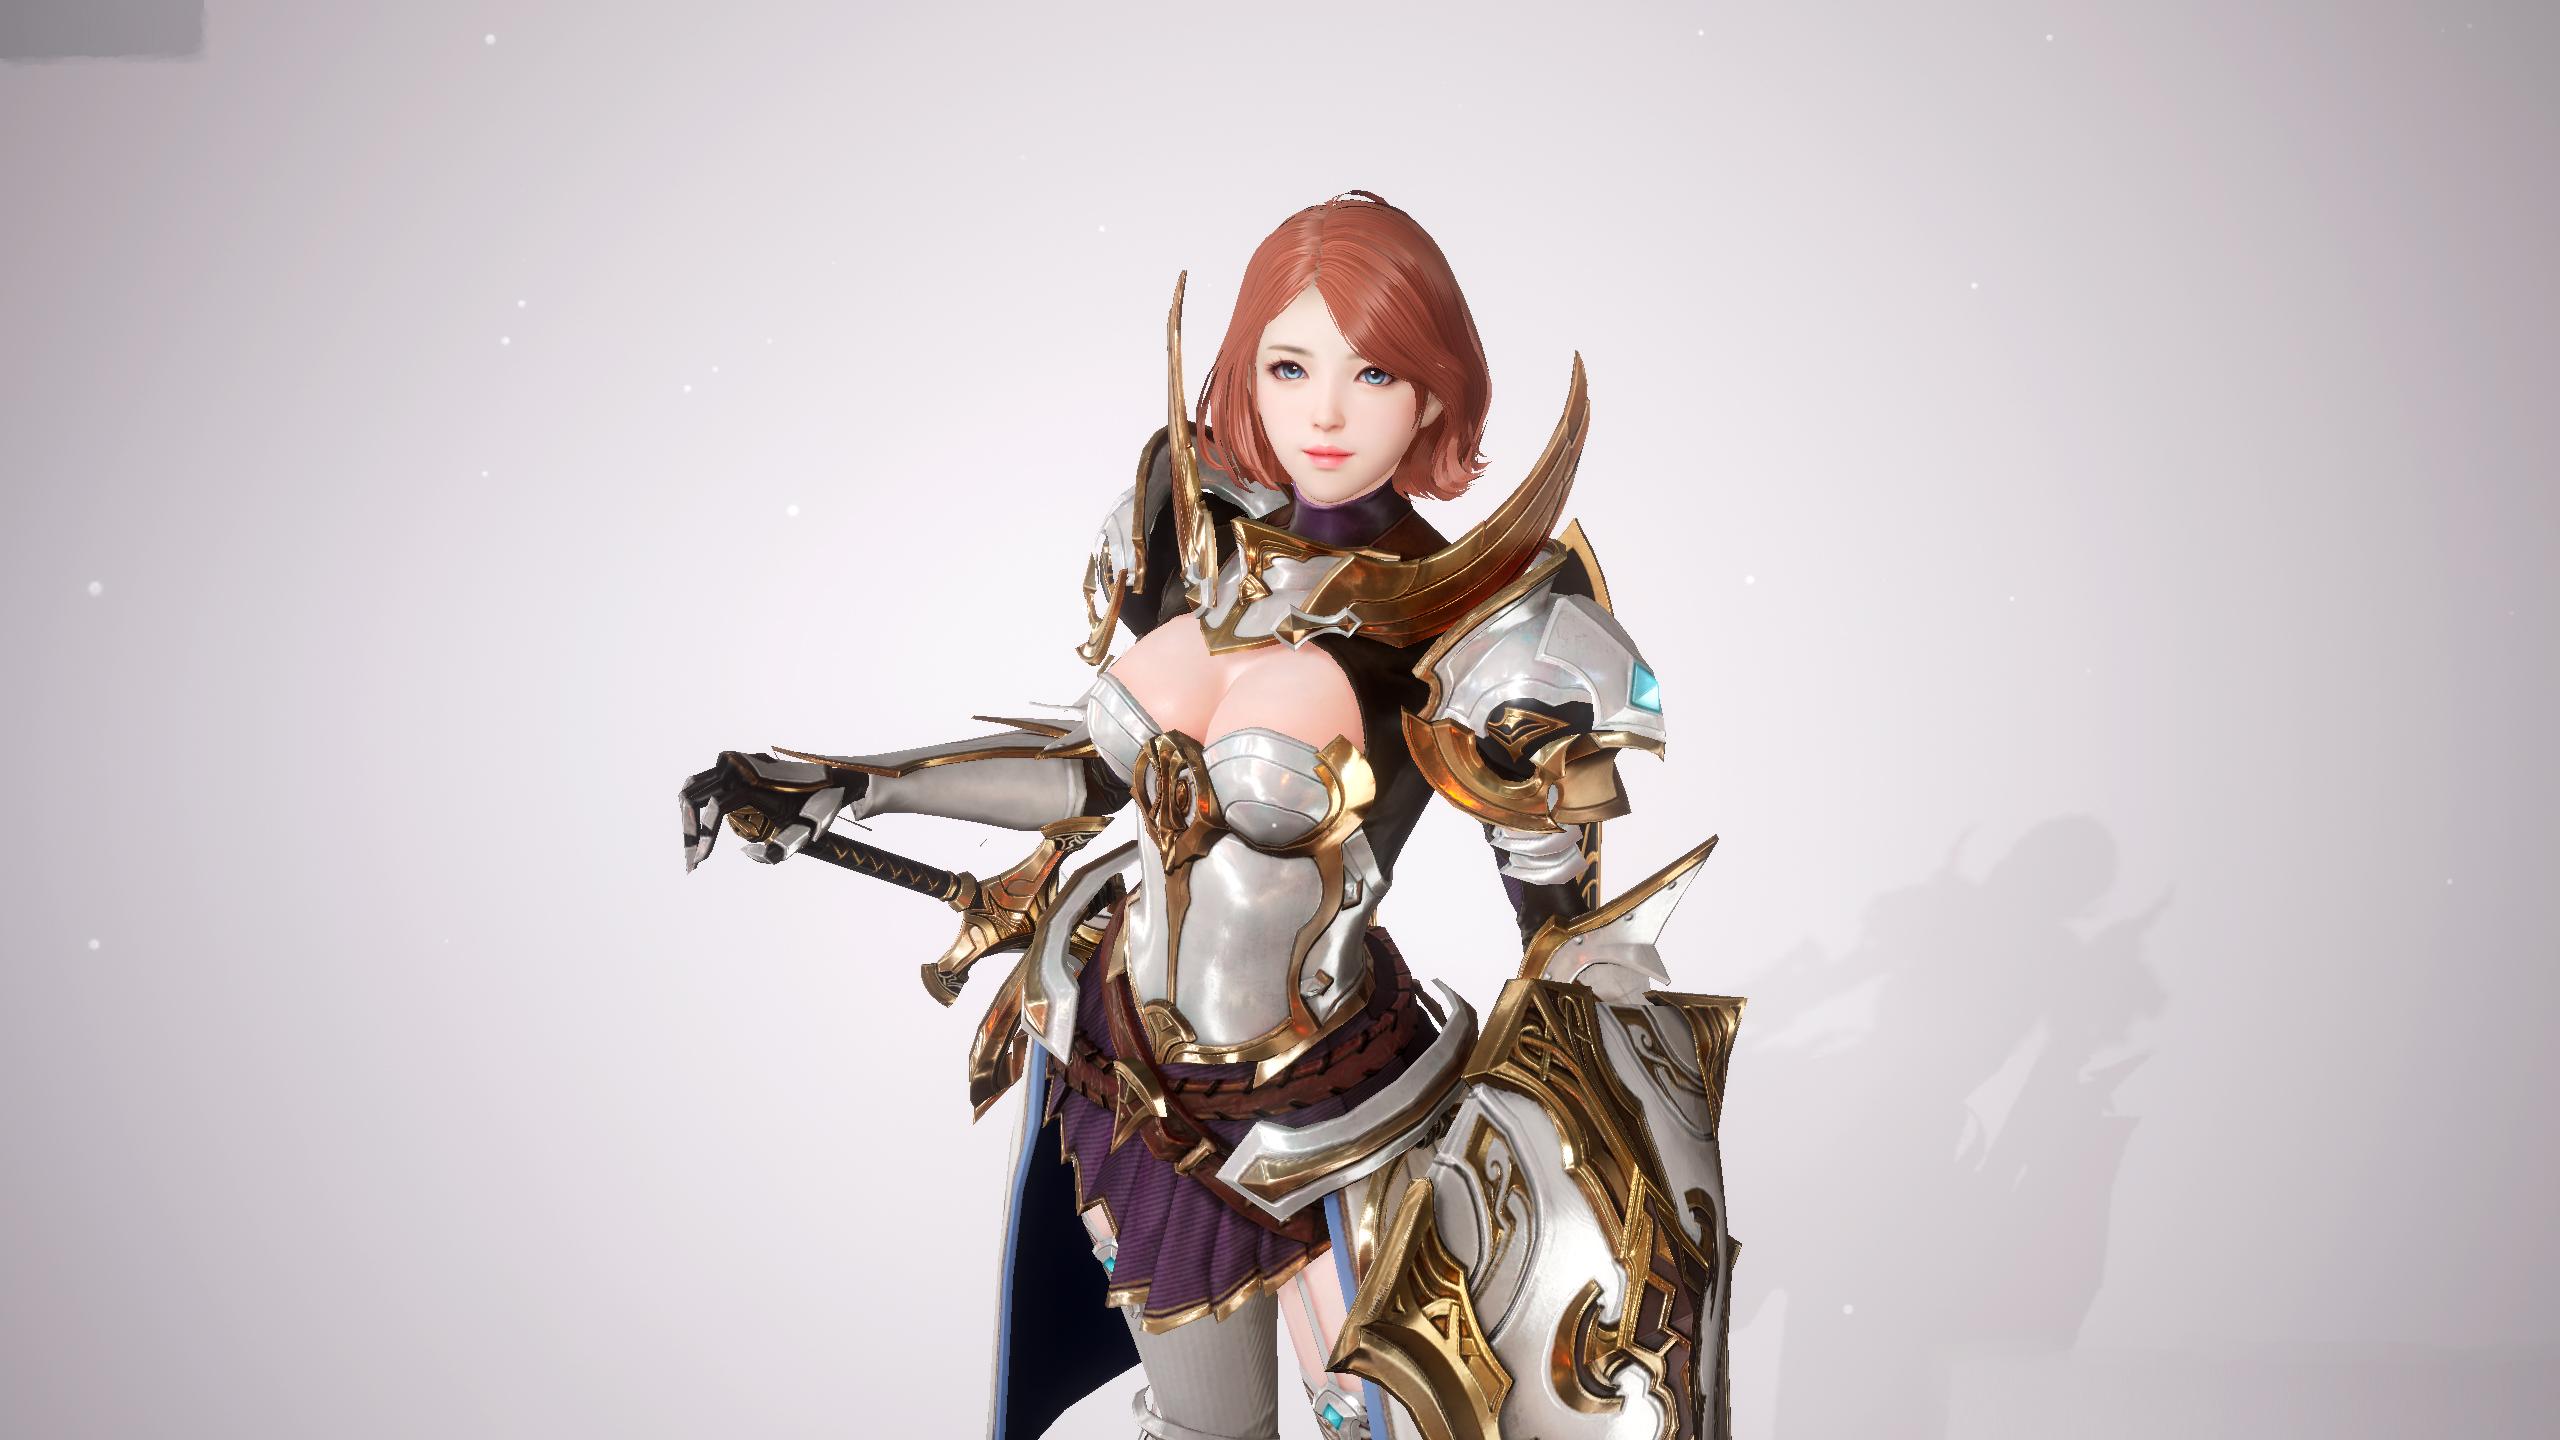 V4 - новая бесплатная MMORPG на движке Unreal Engine 4